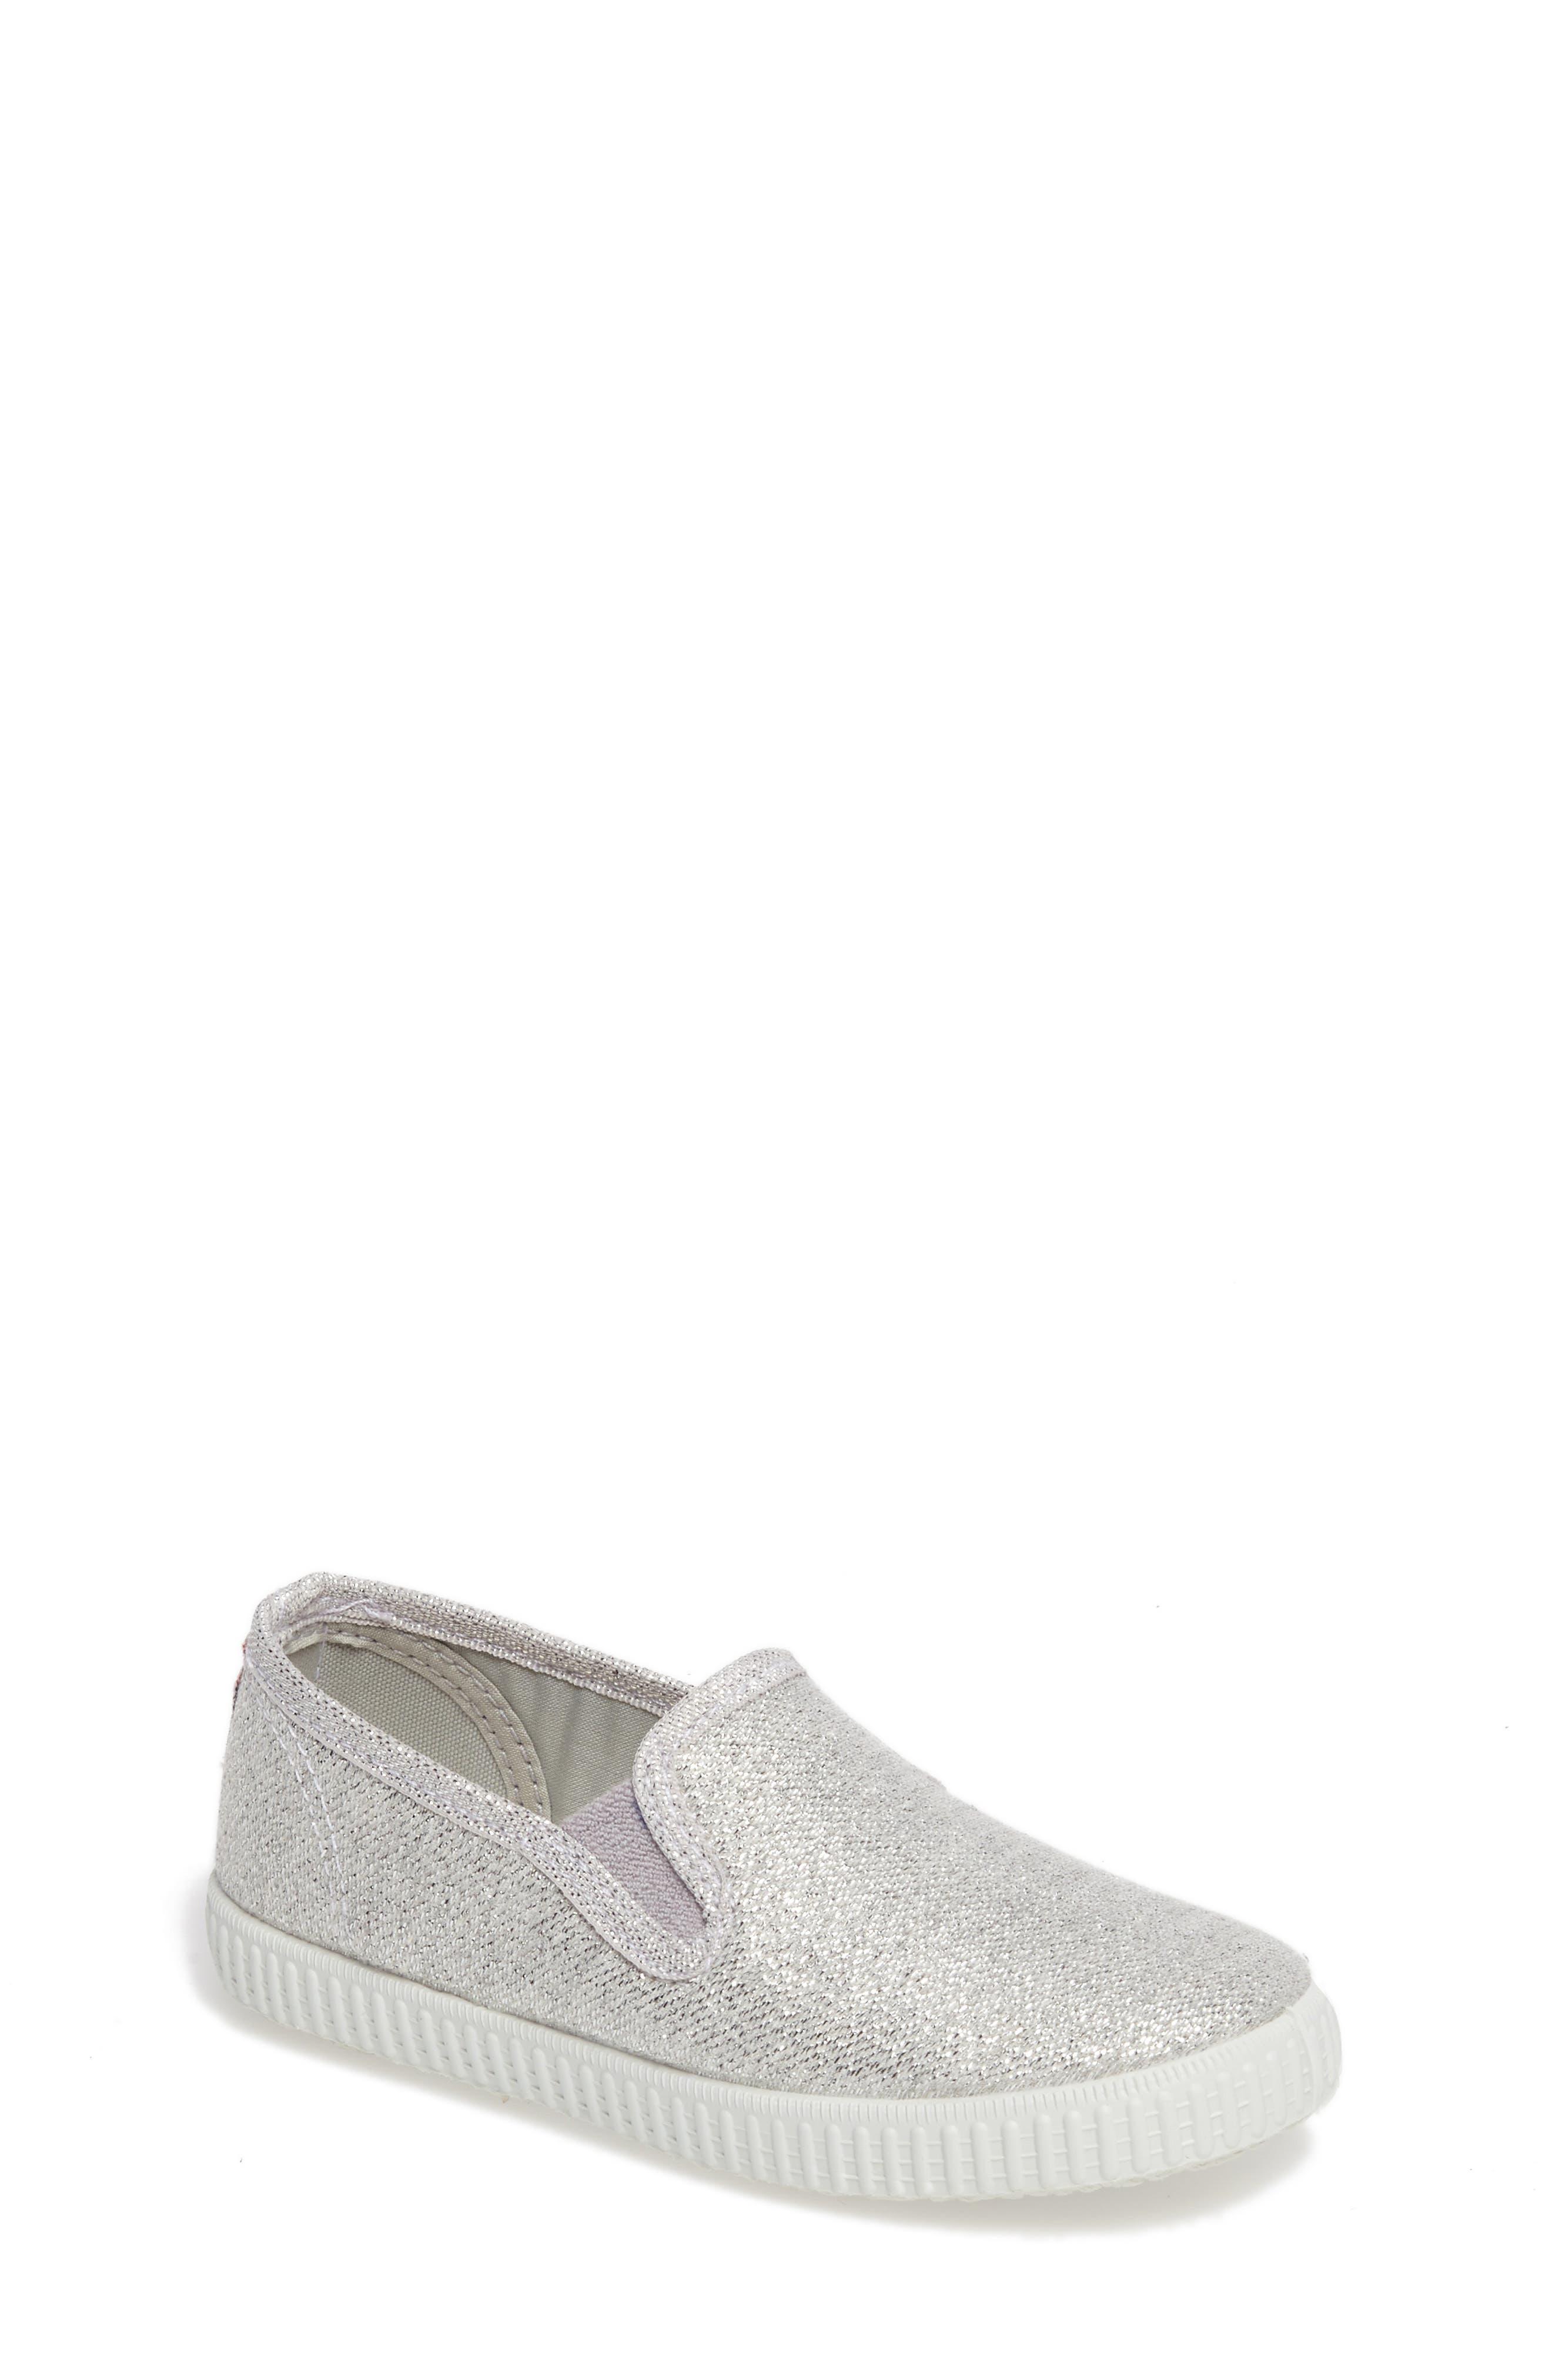 Toddler Cienta Glitter SlipOn Sneaker Size 3US  34EU  Metallic